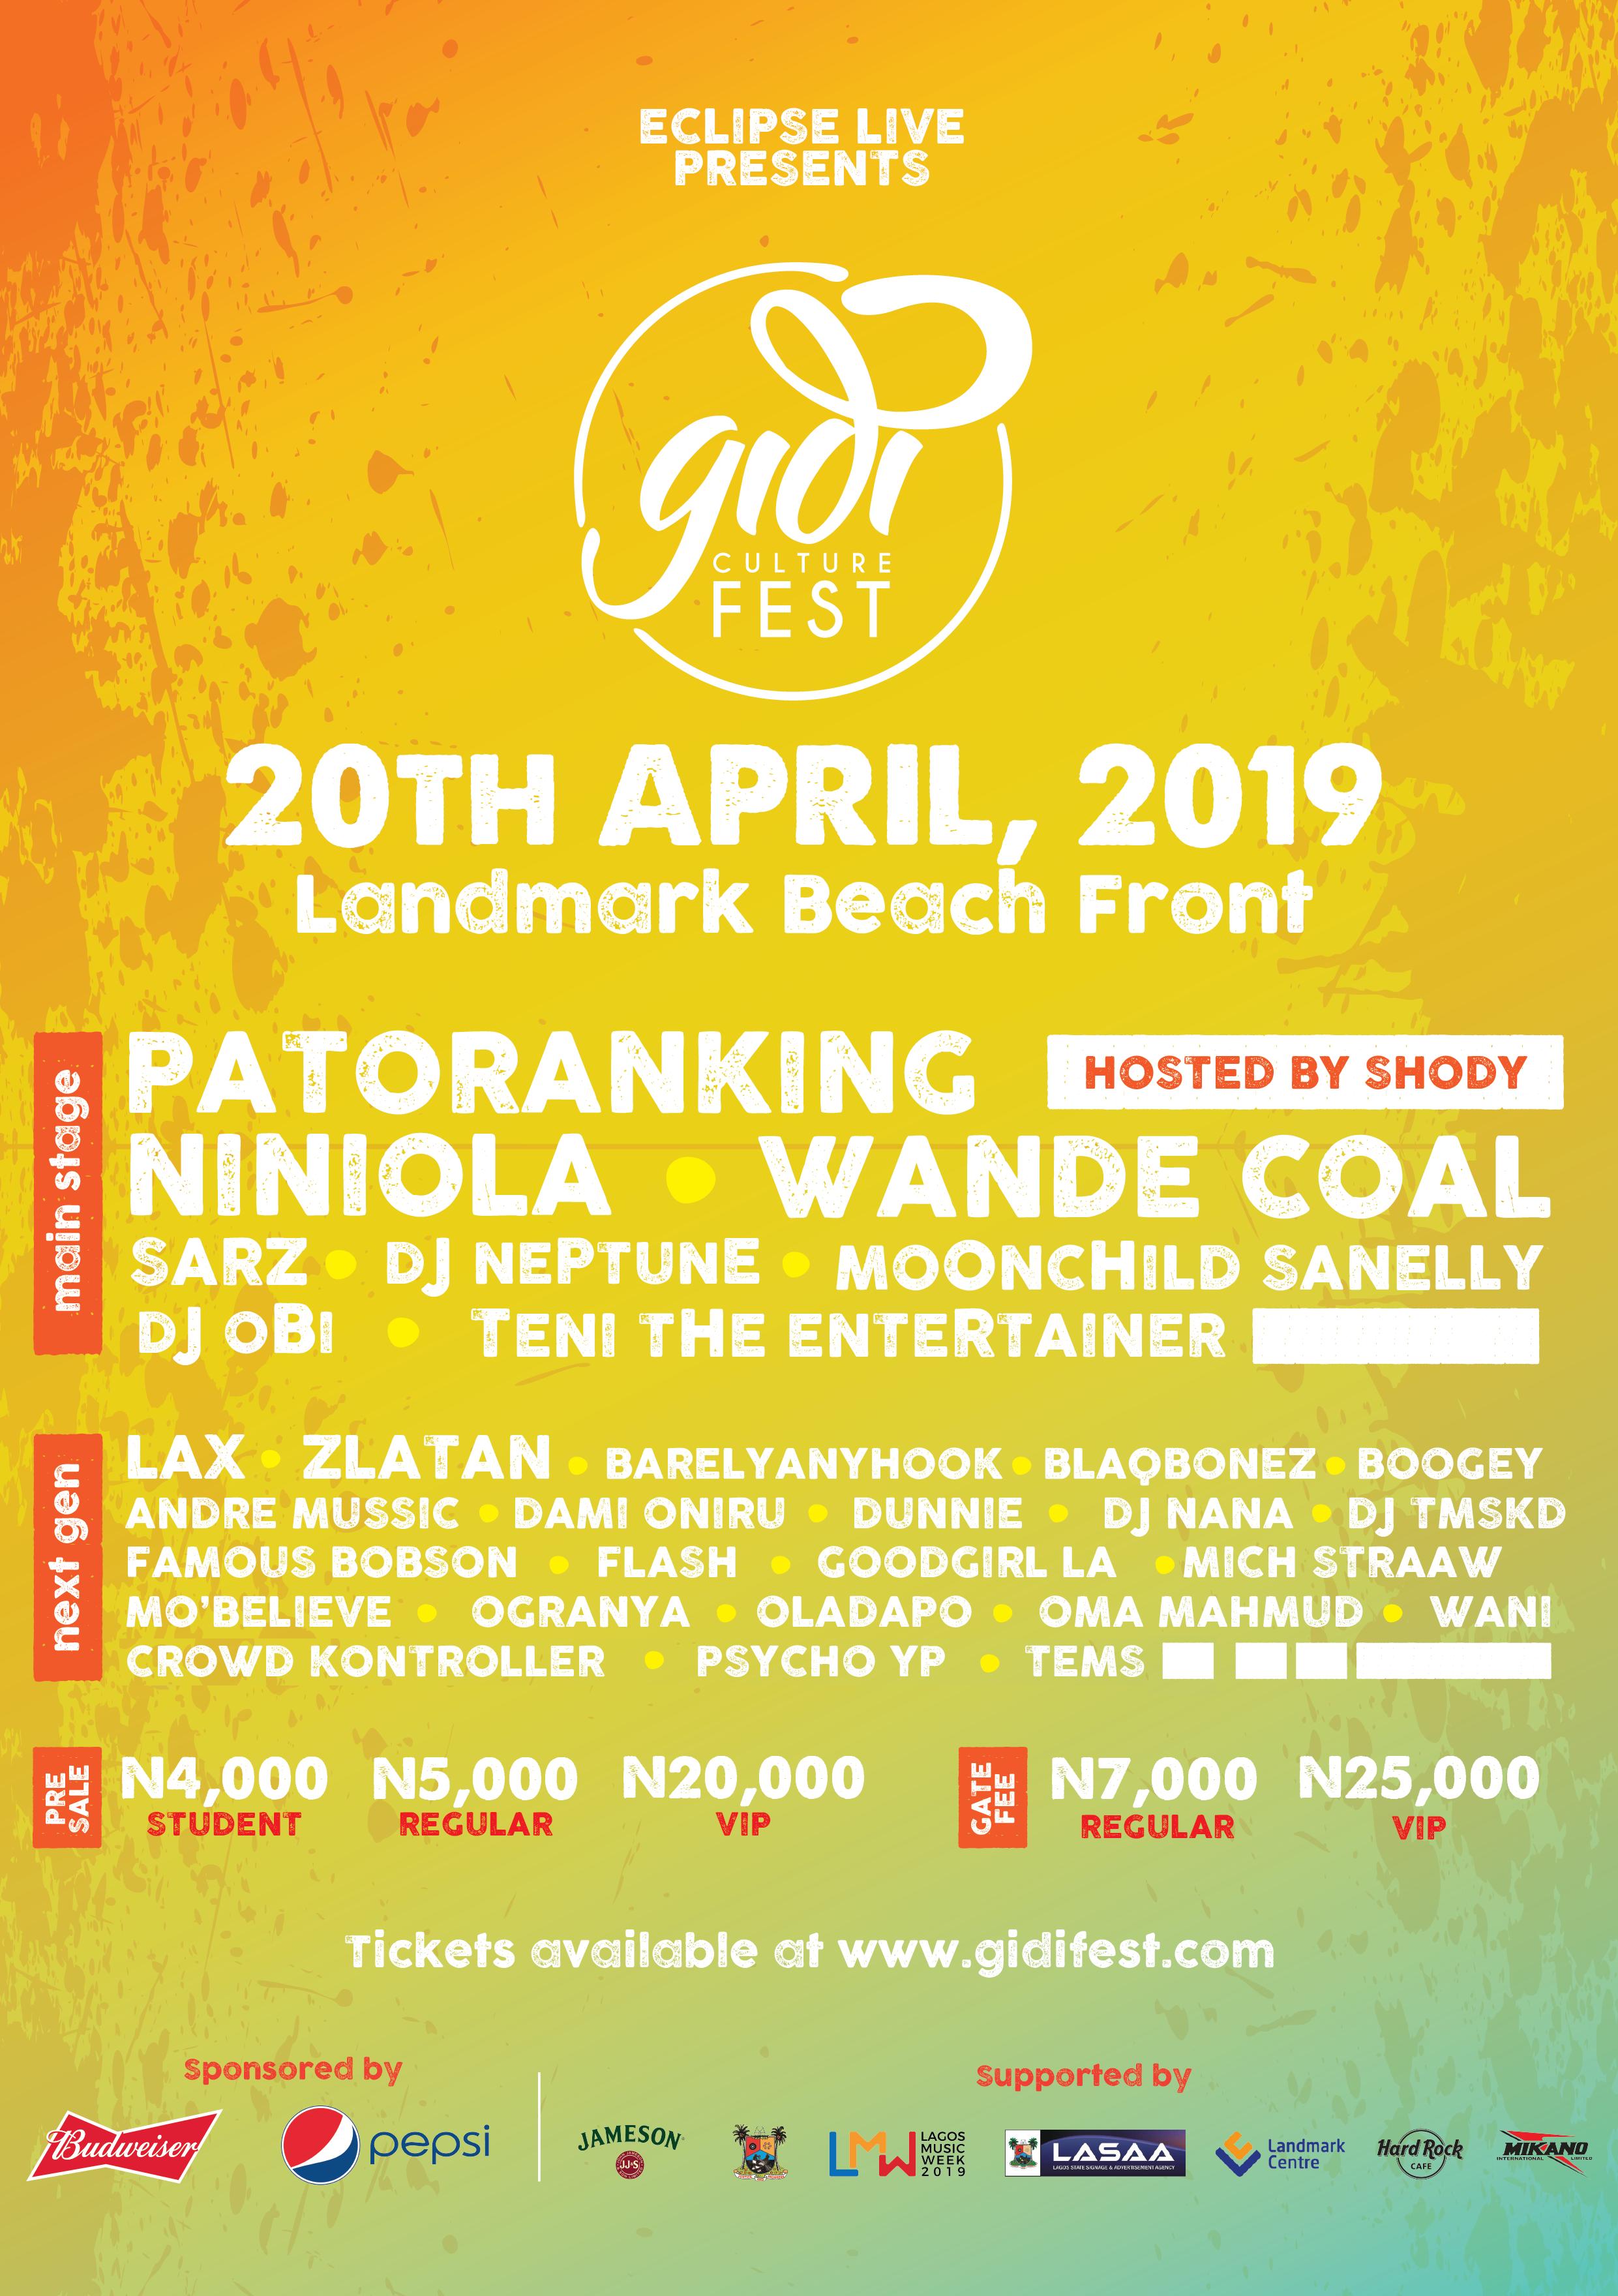 Gidi Culture Festival Announces Second Wave of Acts; Featuring Wande Coal, DJ Obi, Zlatan, L.A.X & Sarz